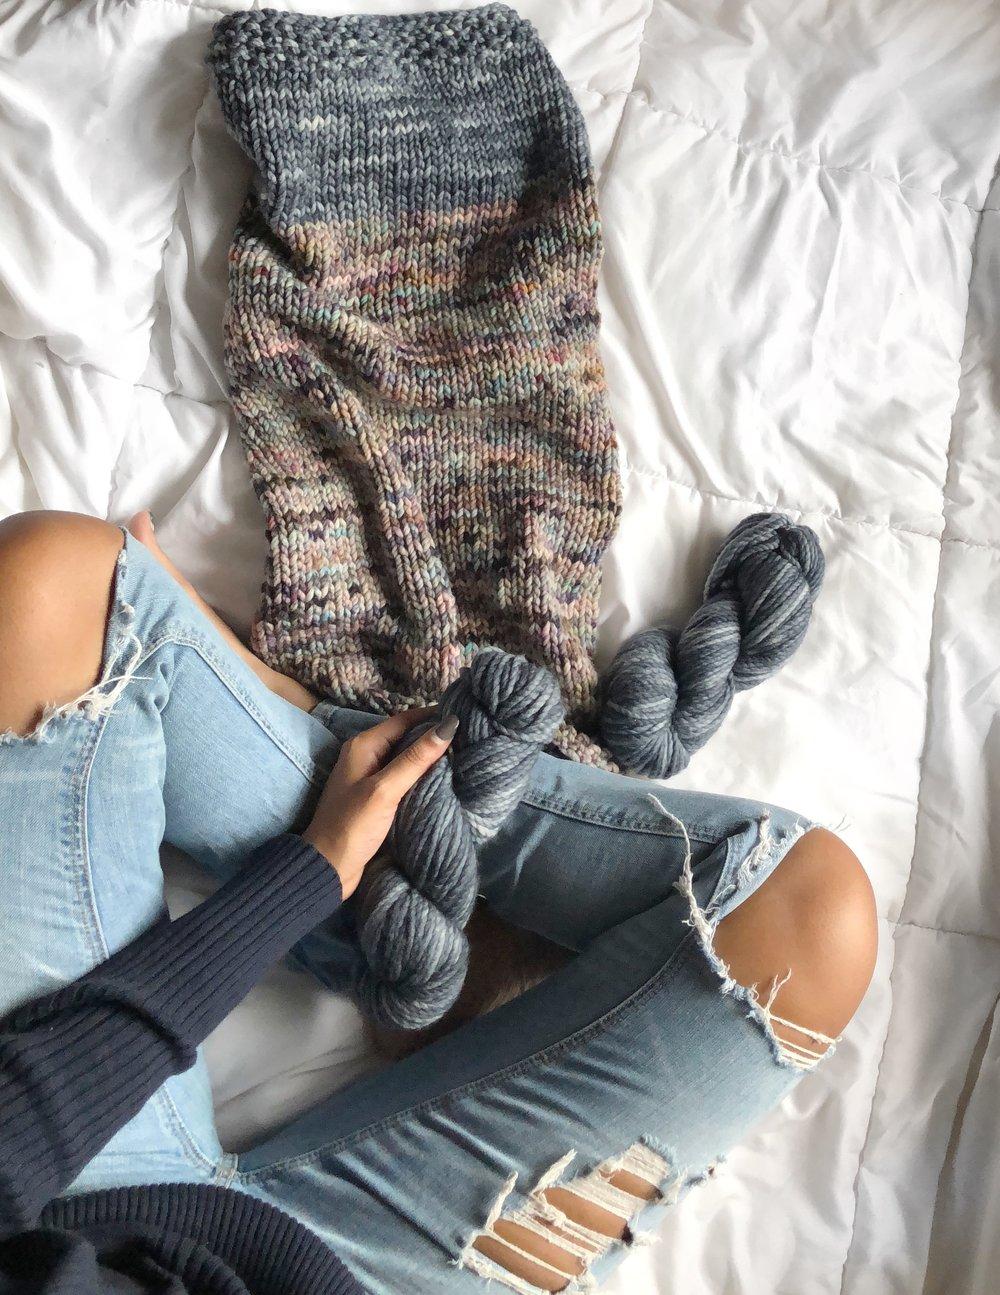 Jewell knitting her Nortknits Koigu Cowl.JPG